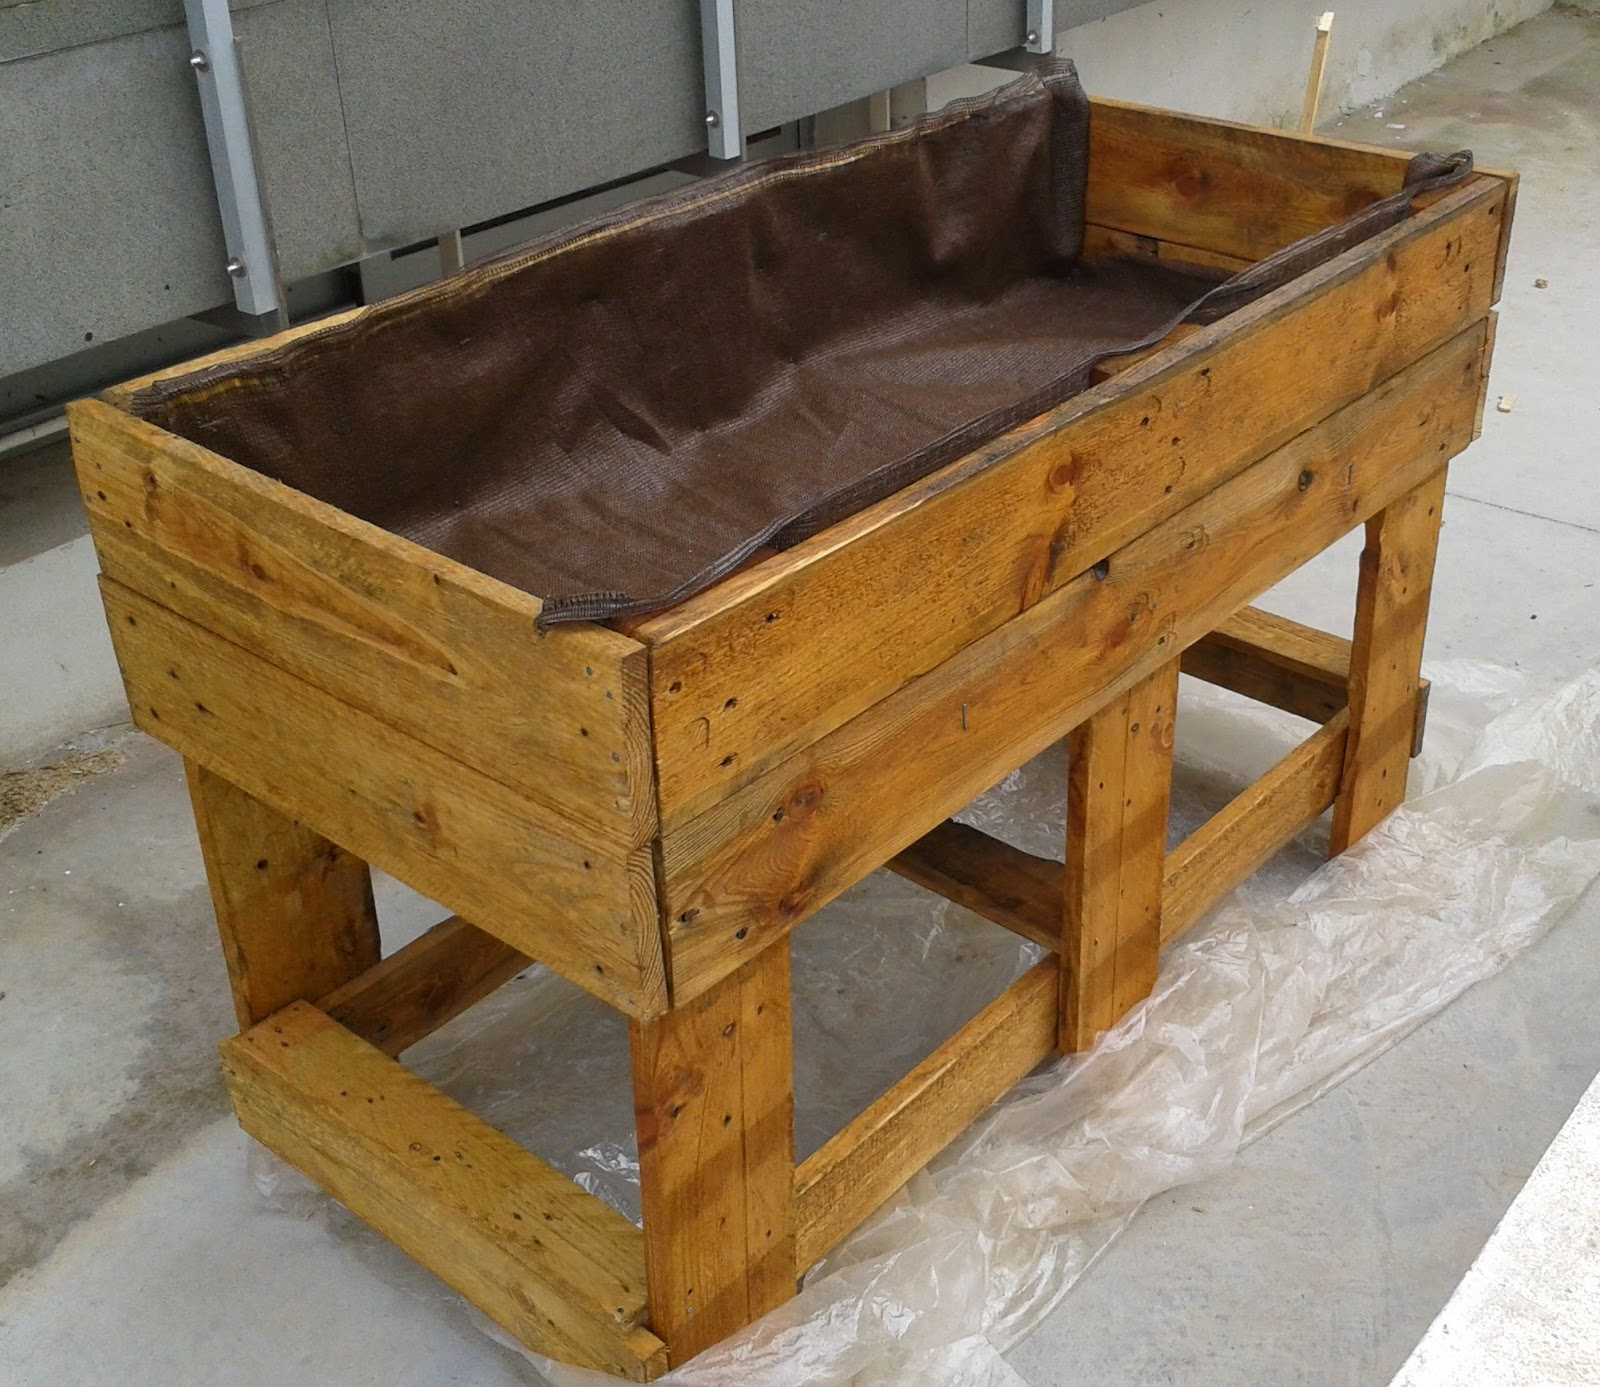 Remueblete jardinera de palets - Como impermeabilizar madera ...